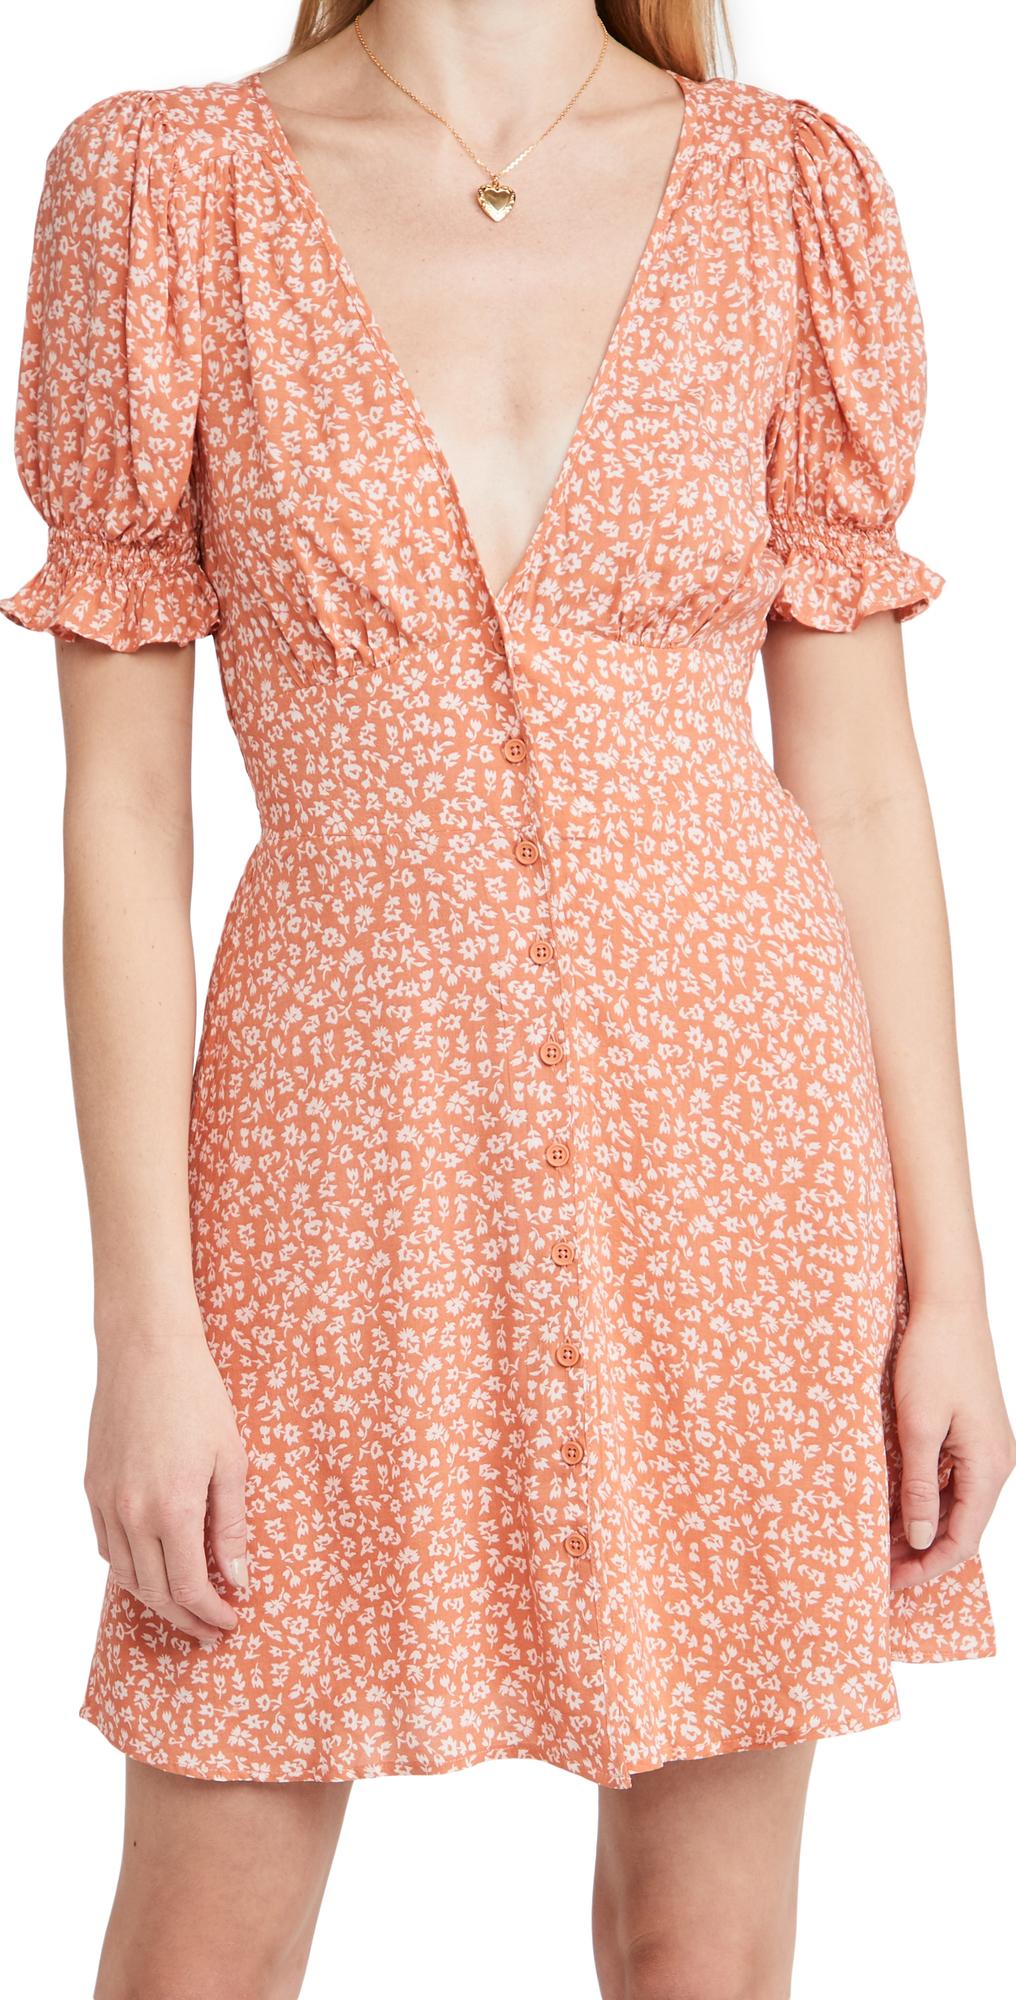 Honeypie Dress